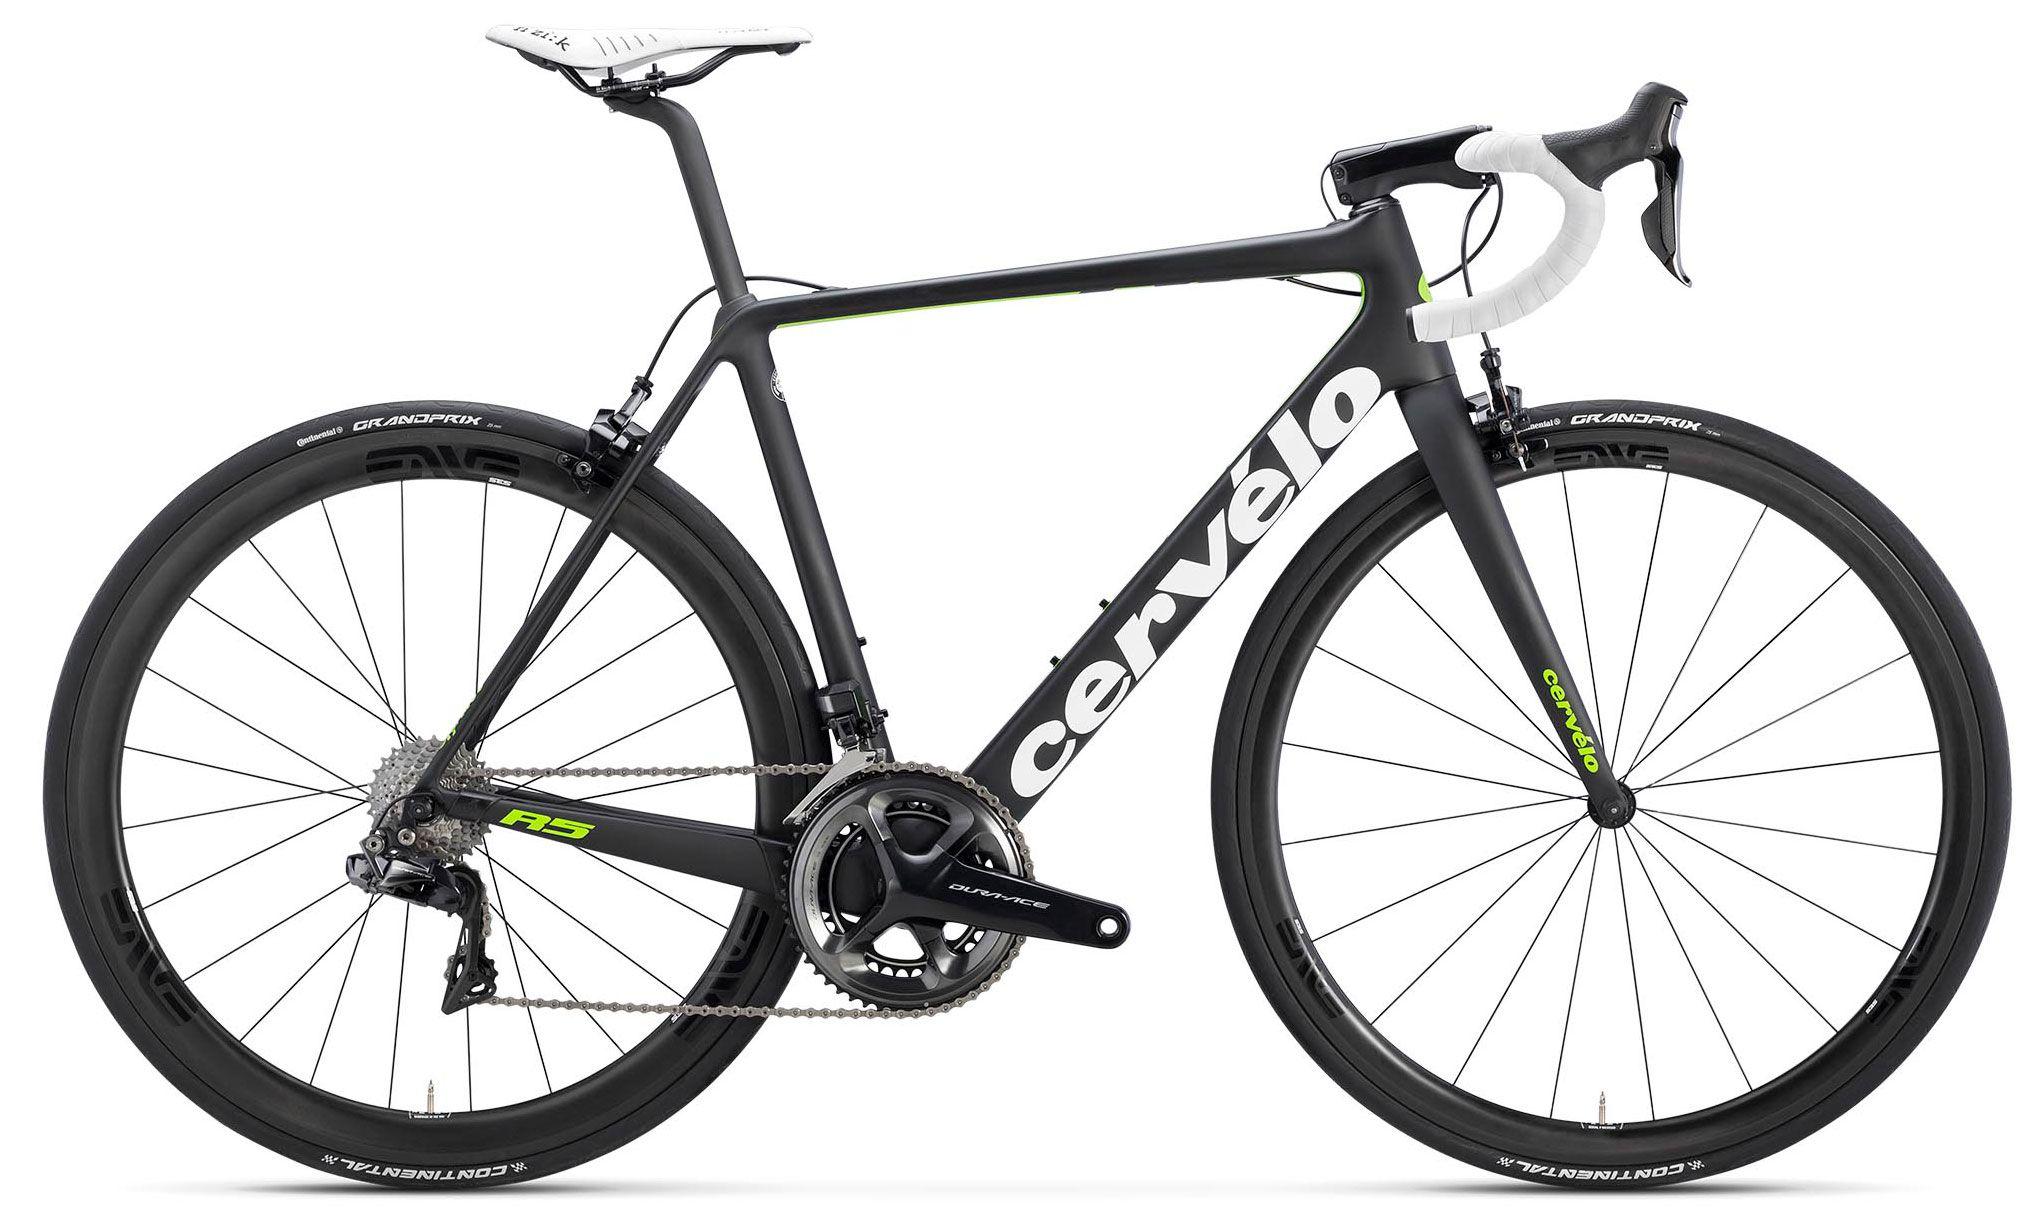 Велосипед Cervelo R5 DA Di2 2018 велосипед cervelo c3 ultegra di2 2018